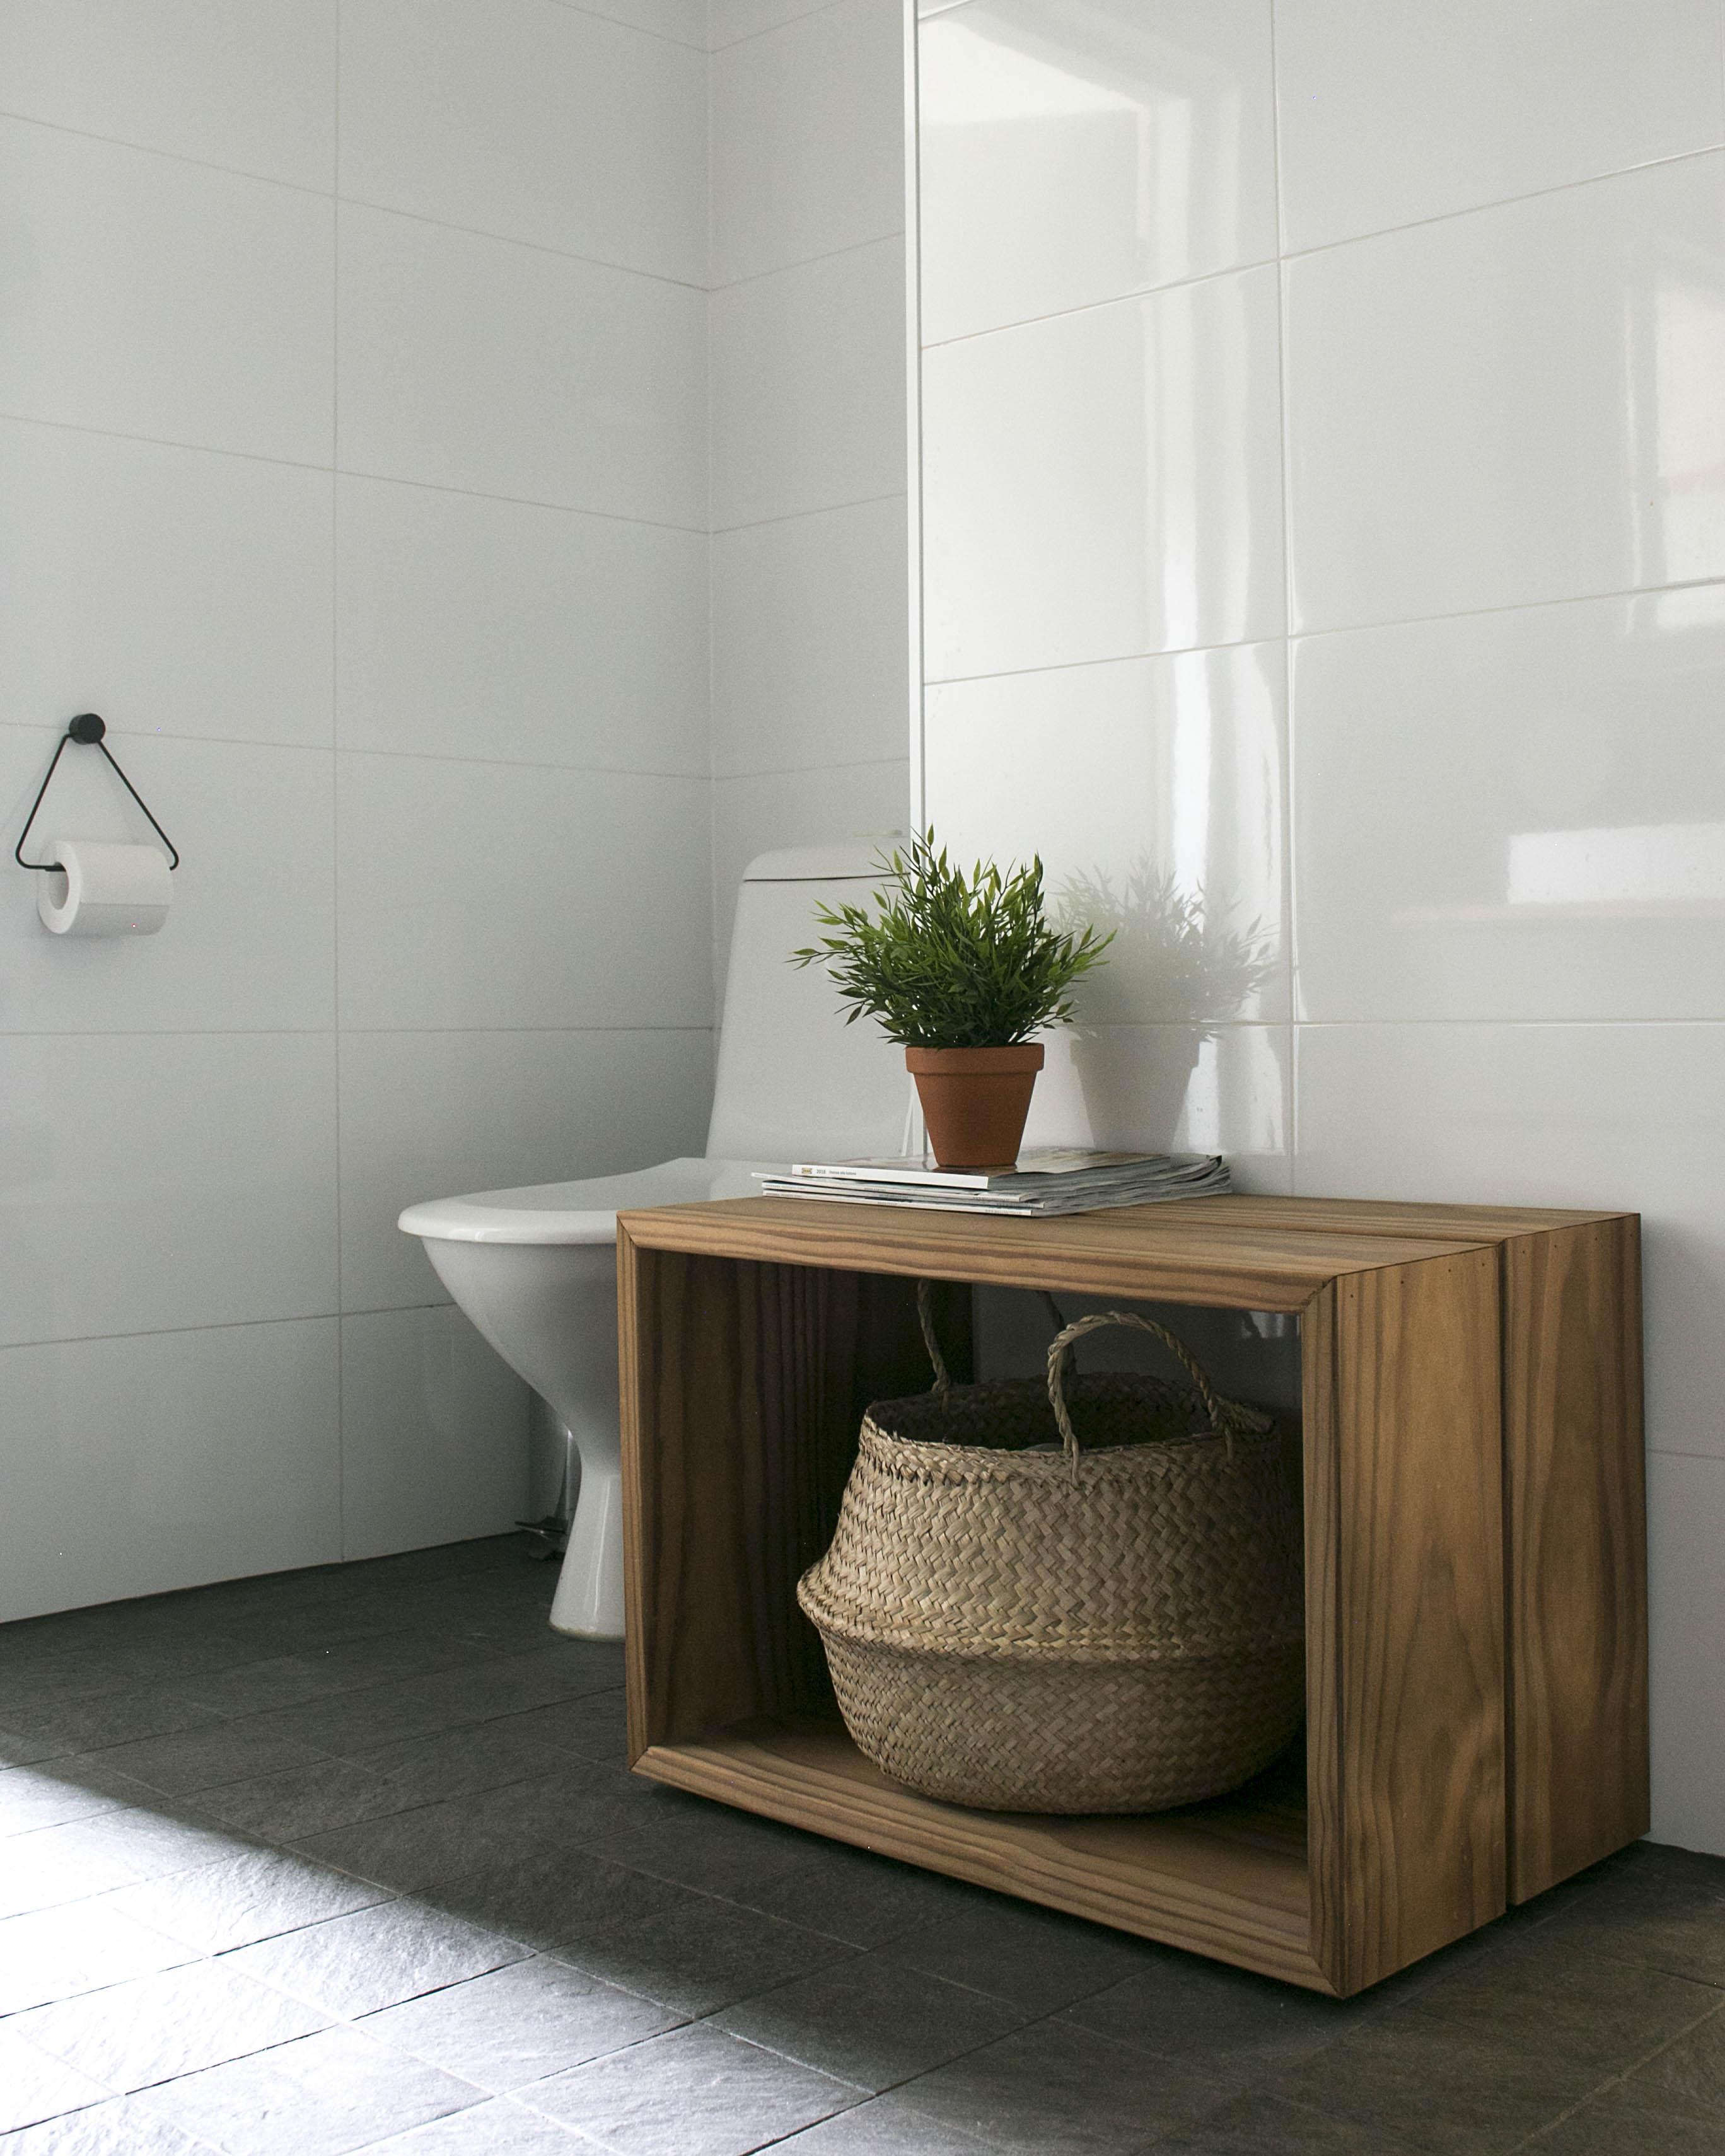 kylpyhuone 5